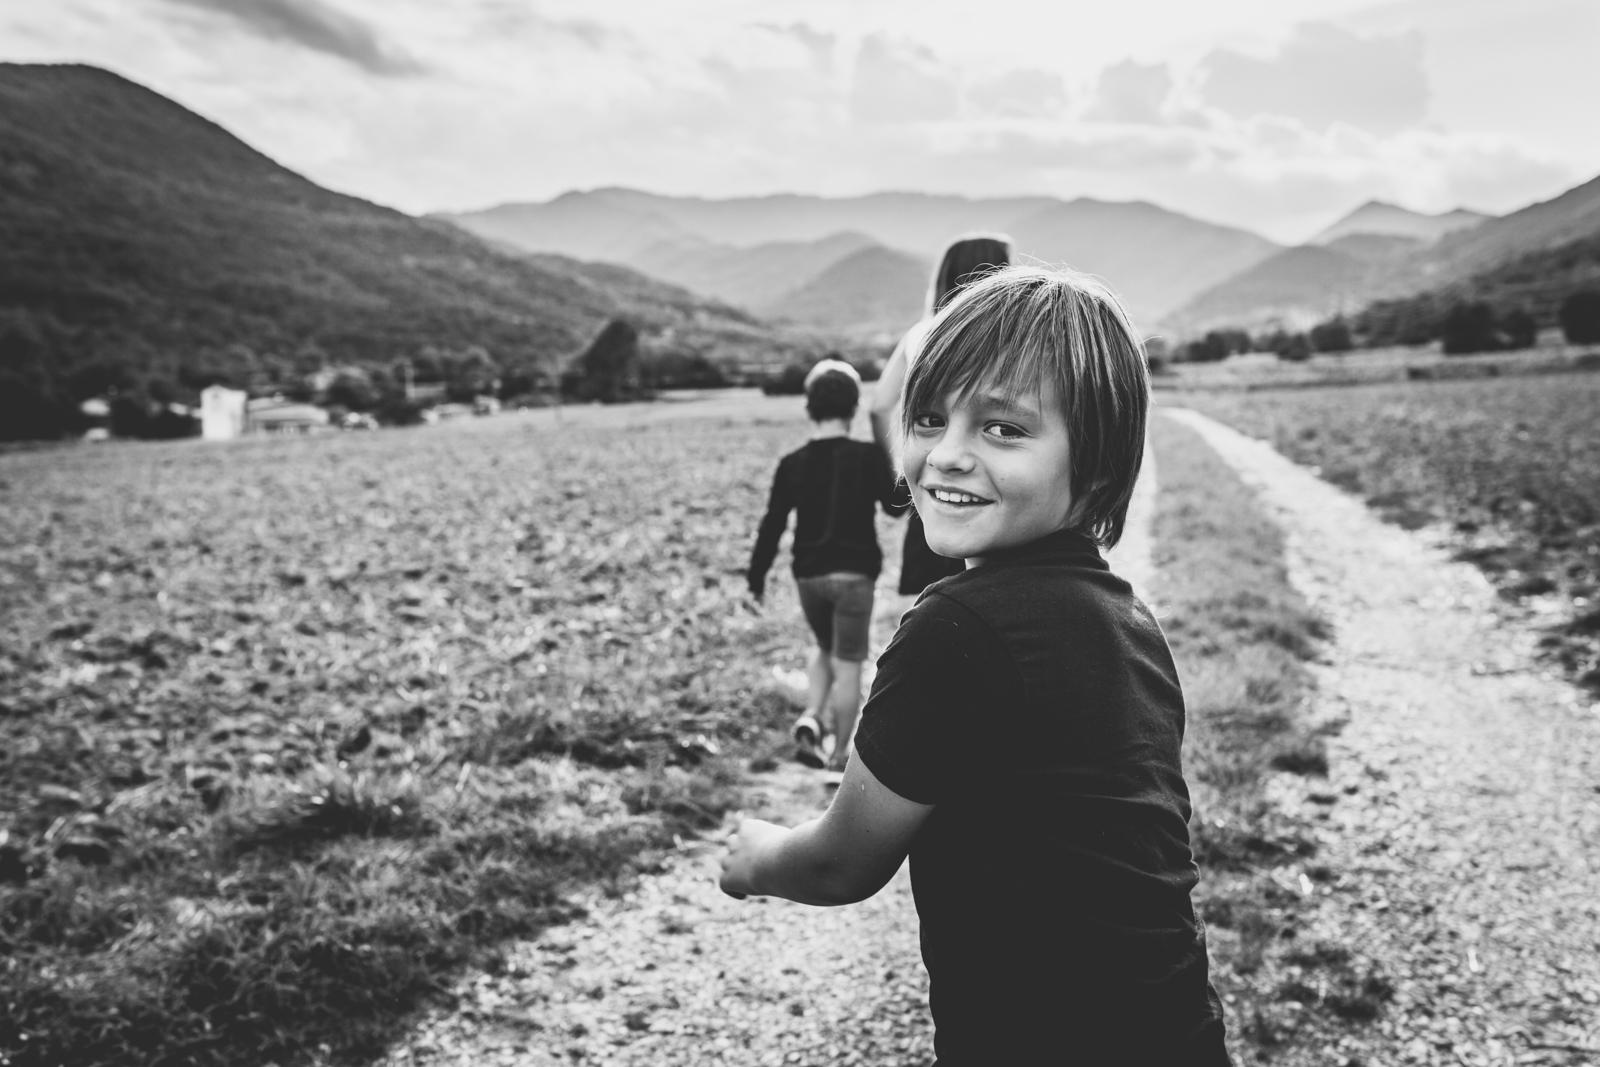 los-niños-del-maiz-family-photographer-barcelona-misshappyflash-1.jpg